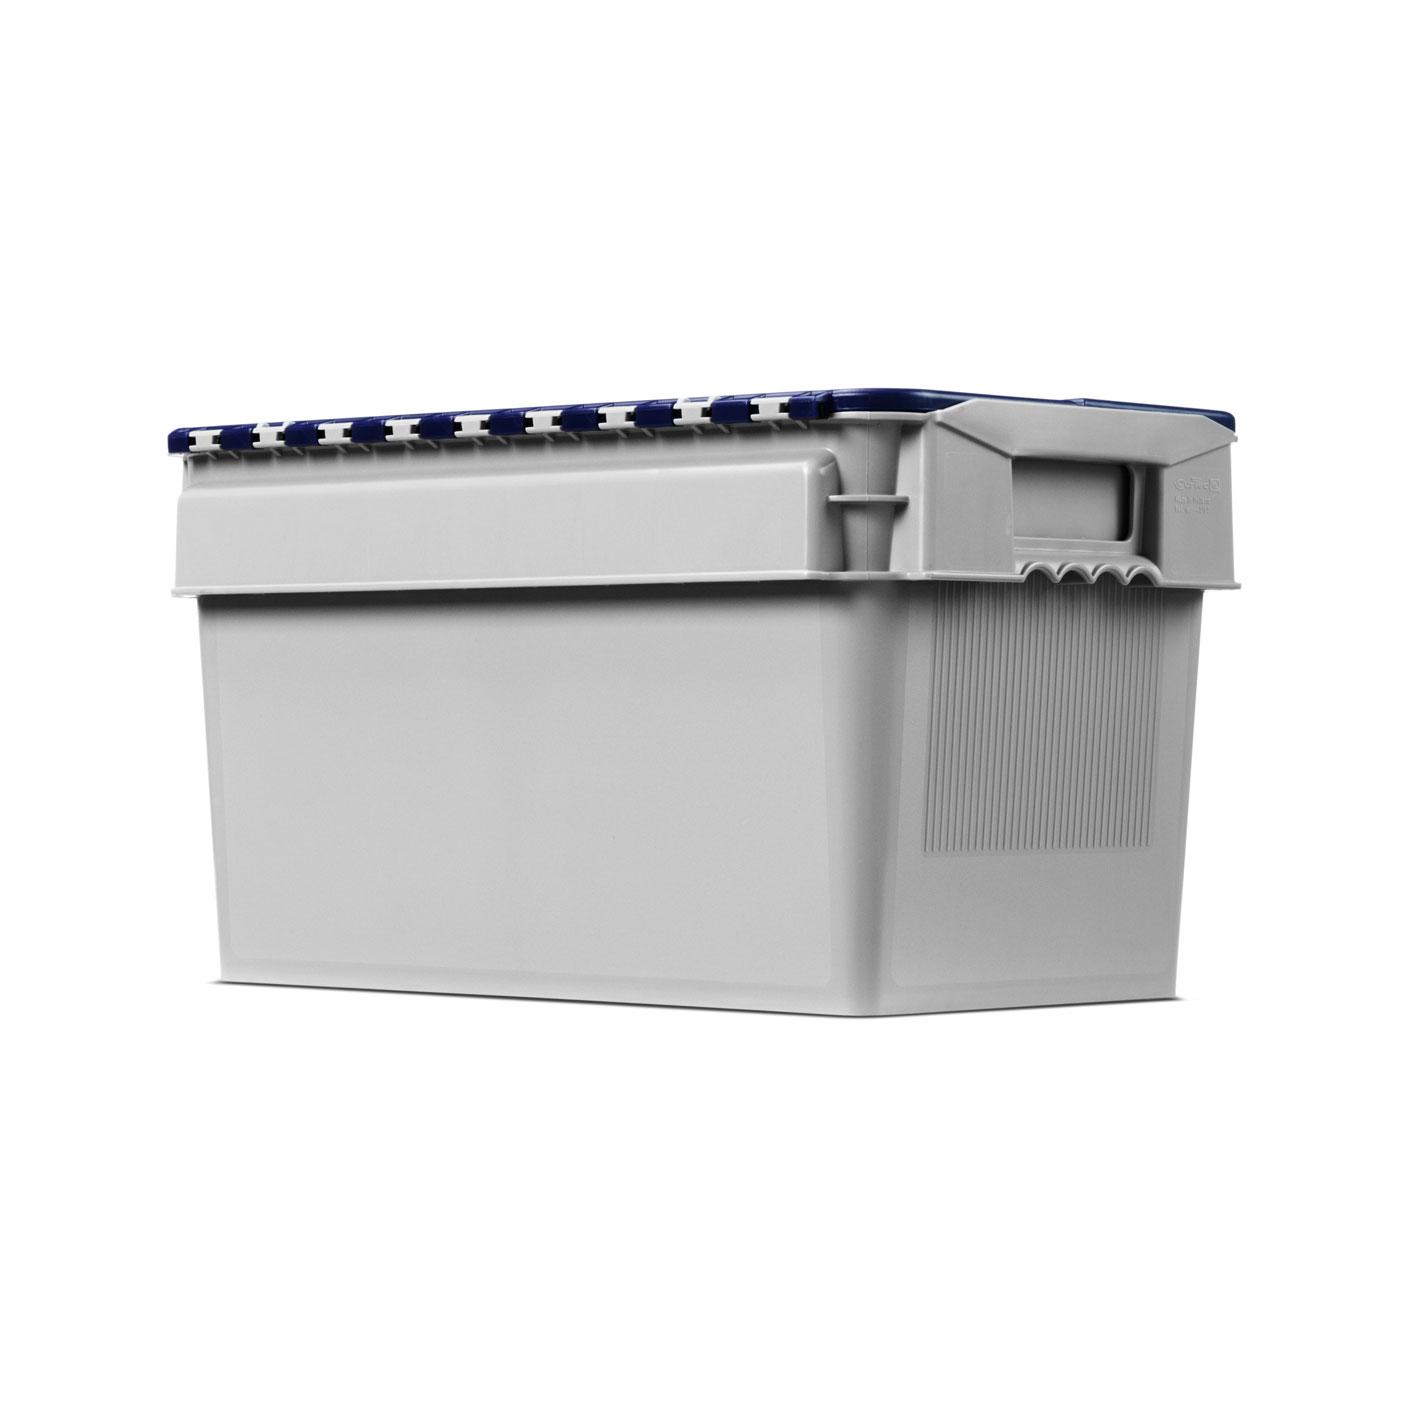 25 litre UN lidded crate